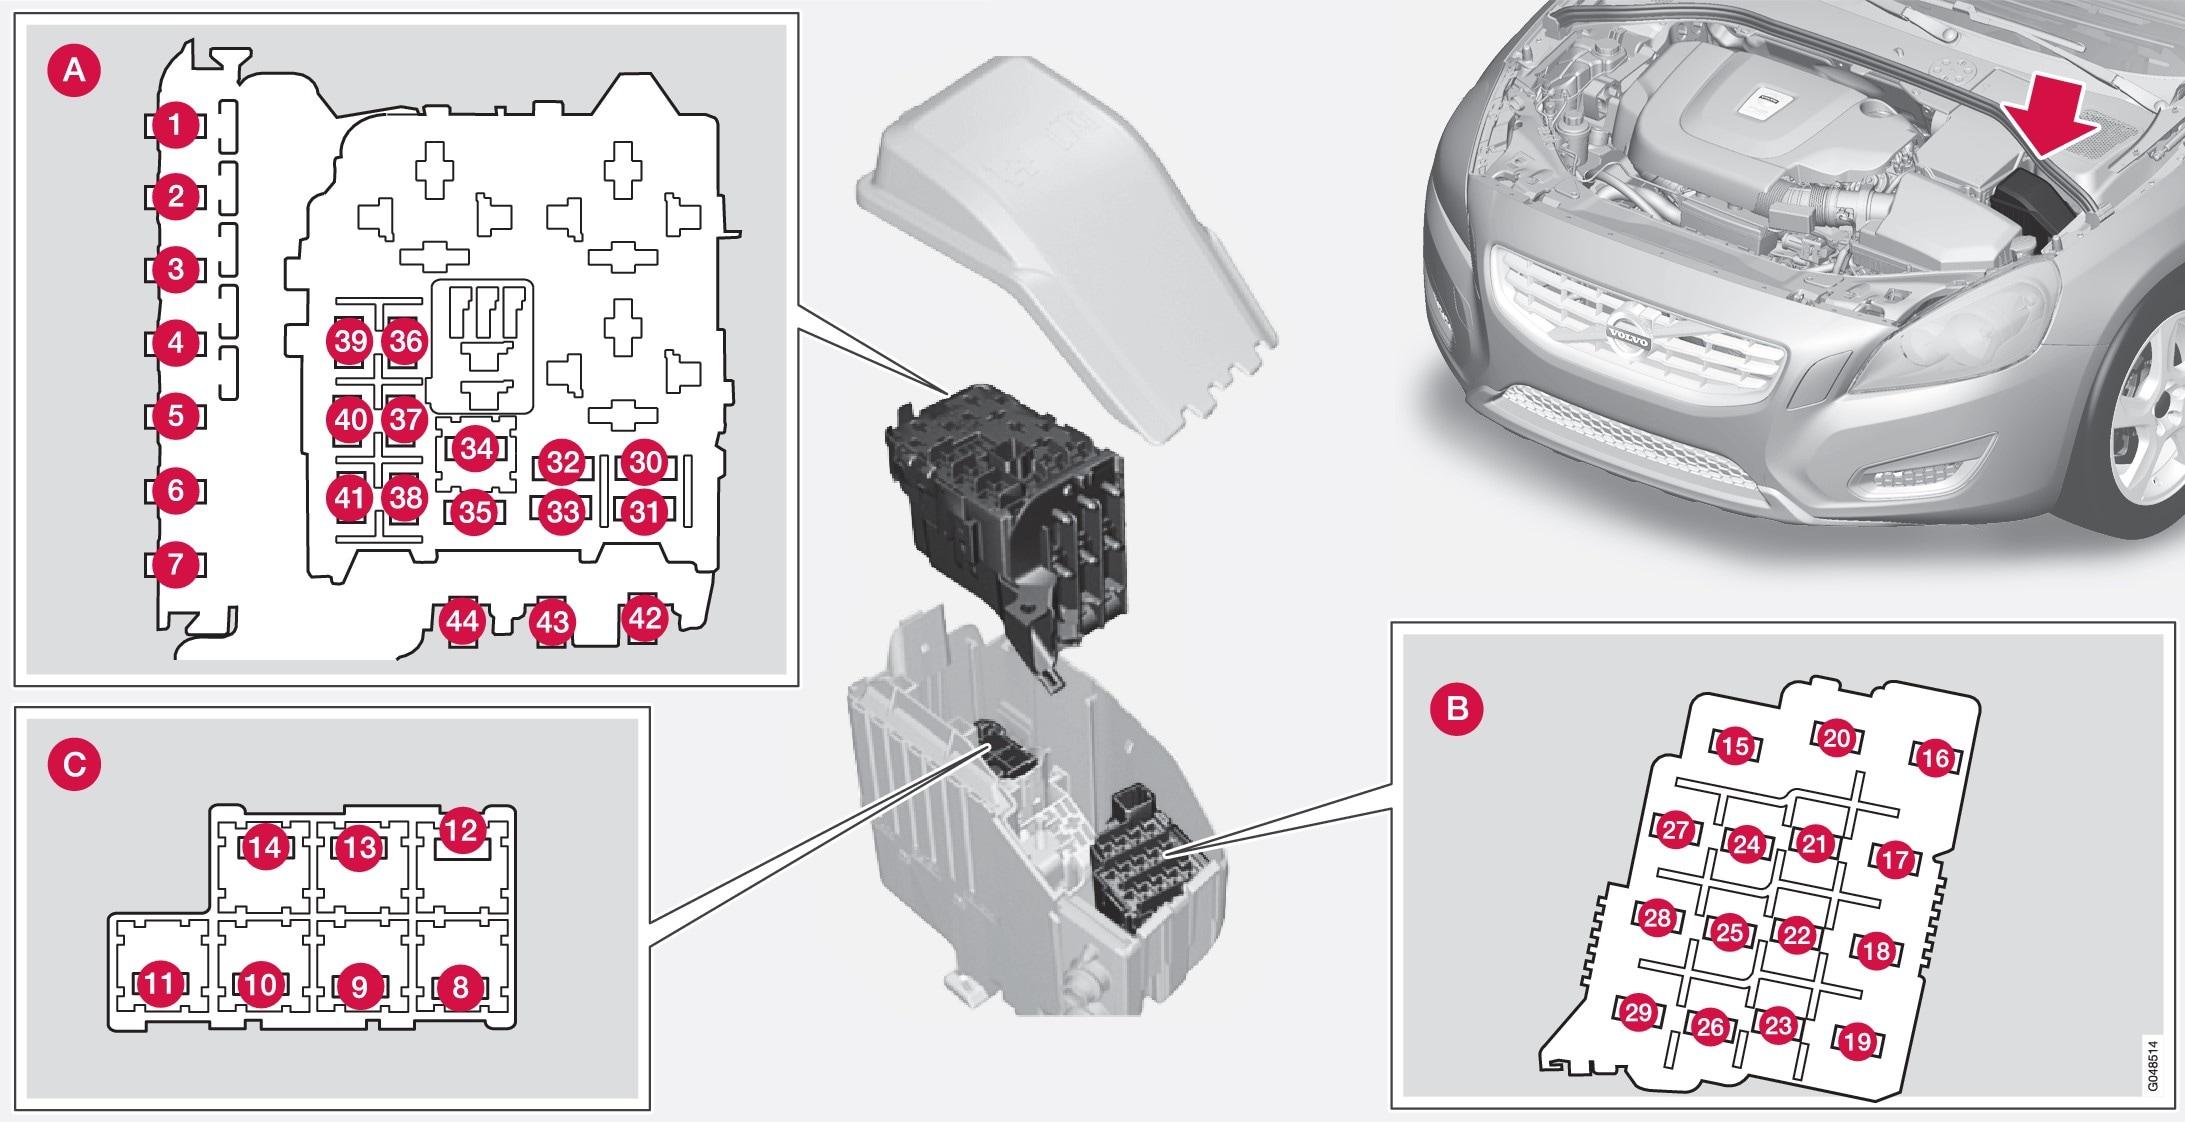 P3-1020-S60/V60 Engine room fuse box